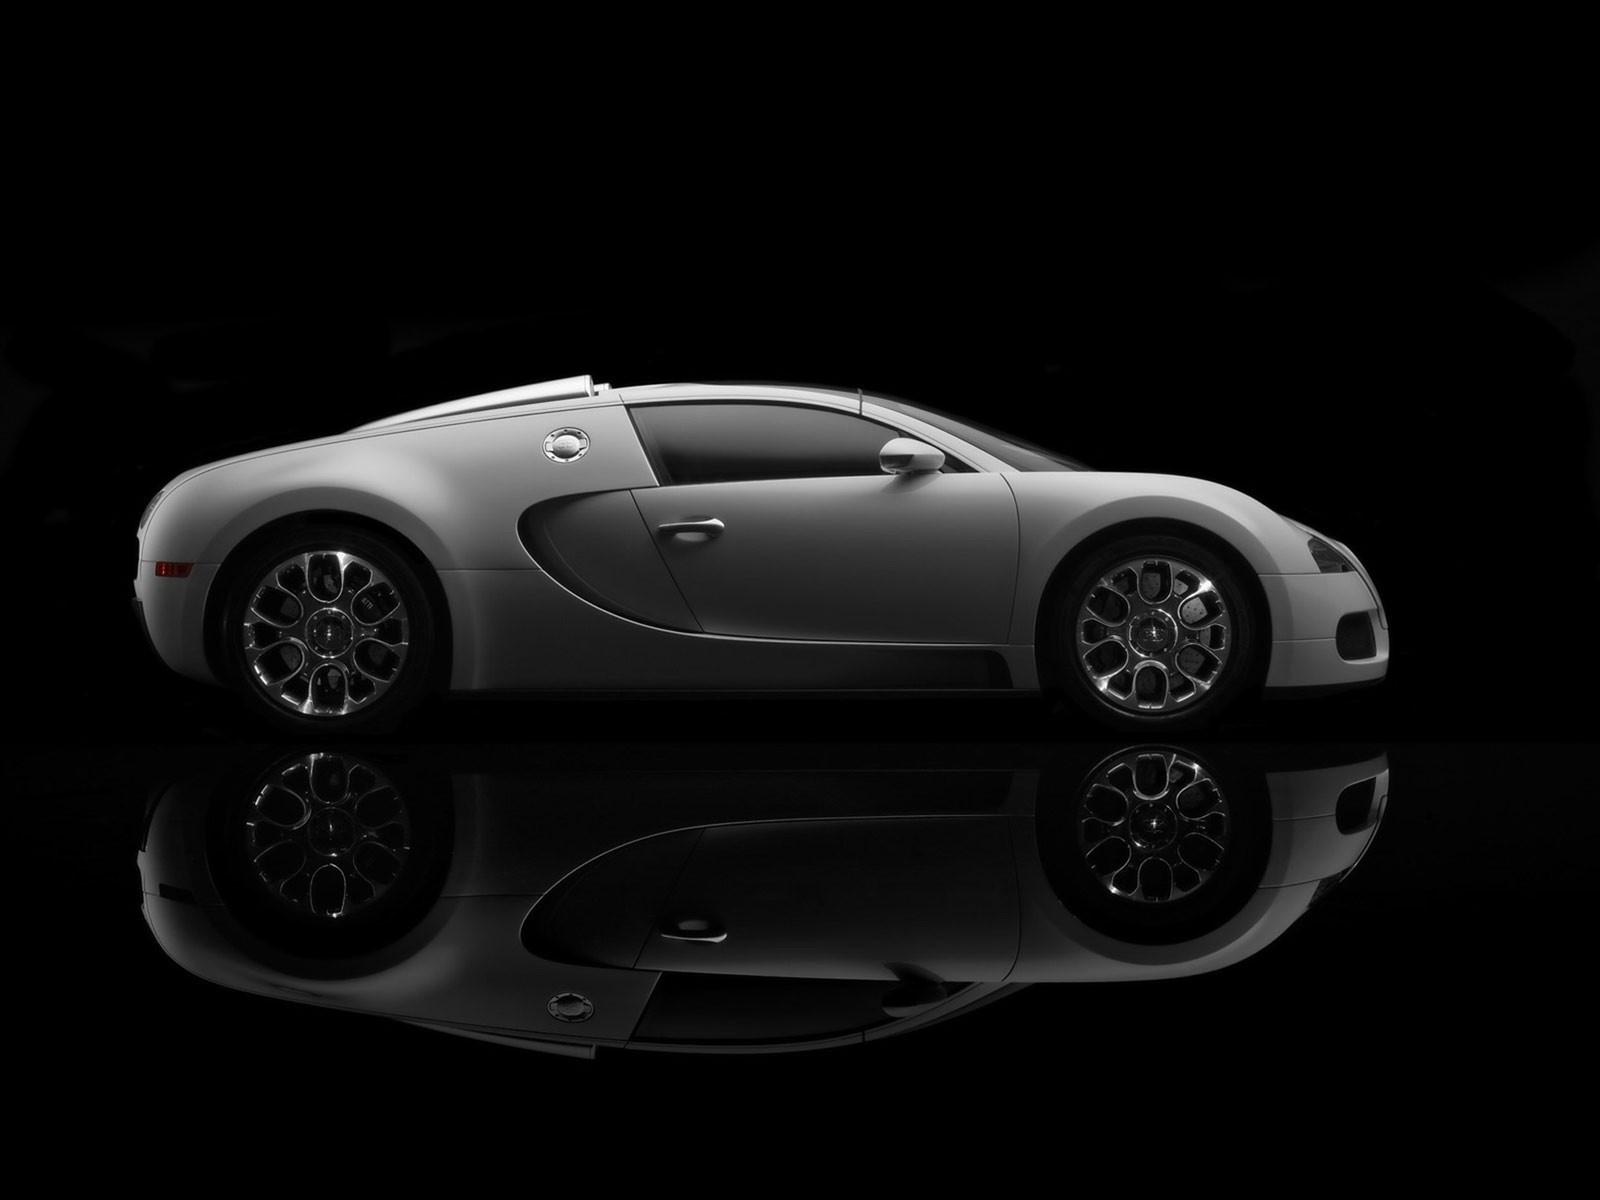 Bugatti, car, wallpaper, скачать фото обои на рабочий стол